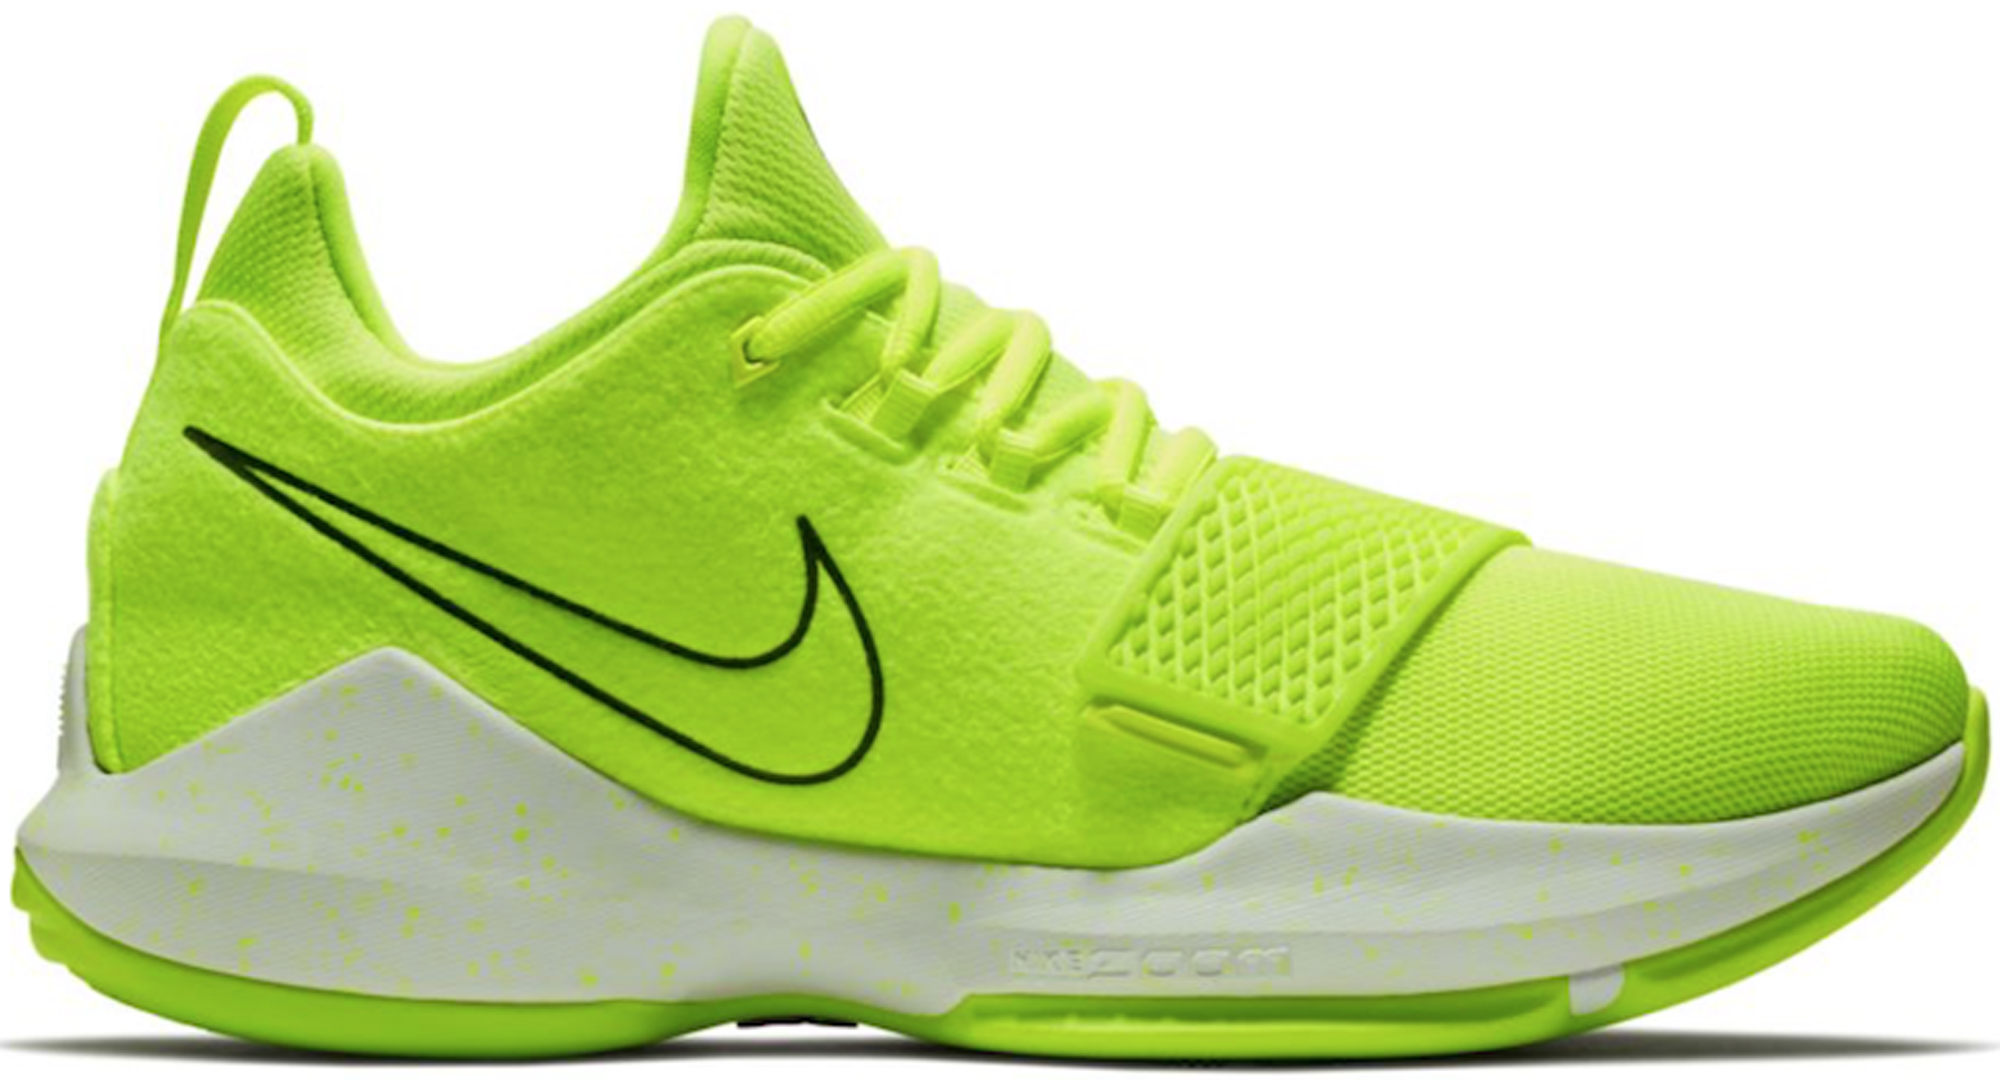 Nike PG 1 Volt - StockX News